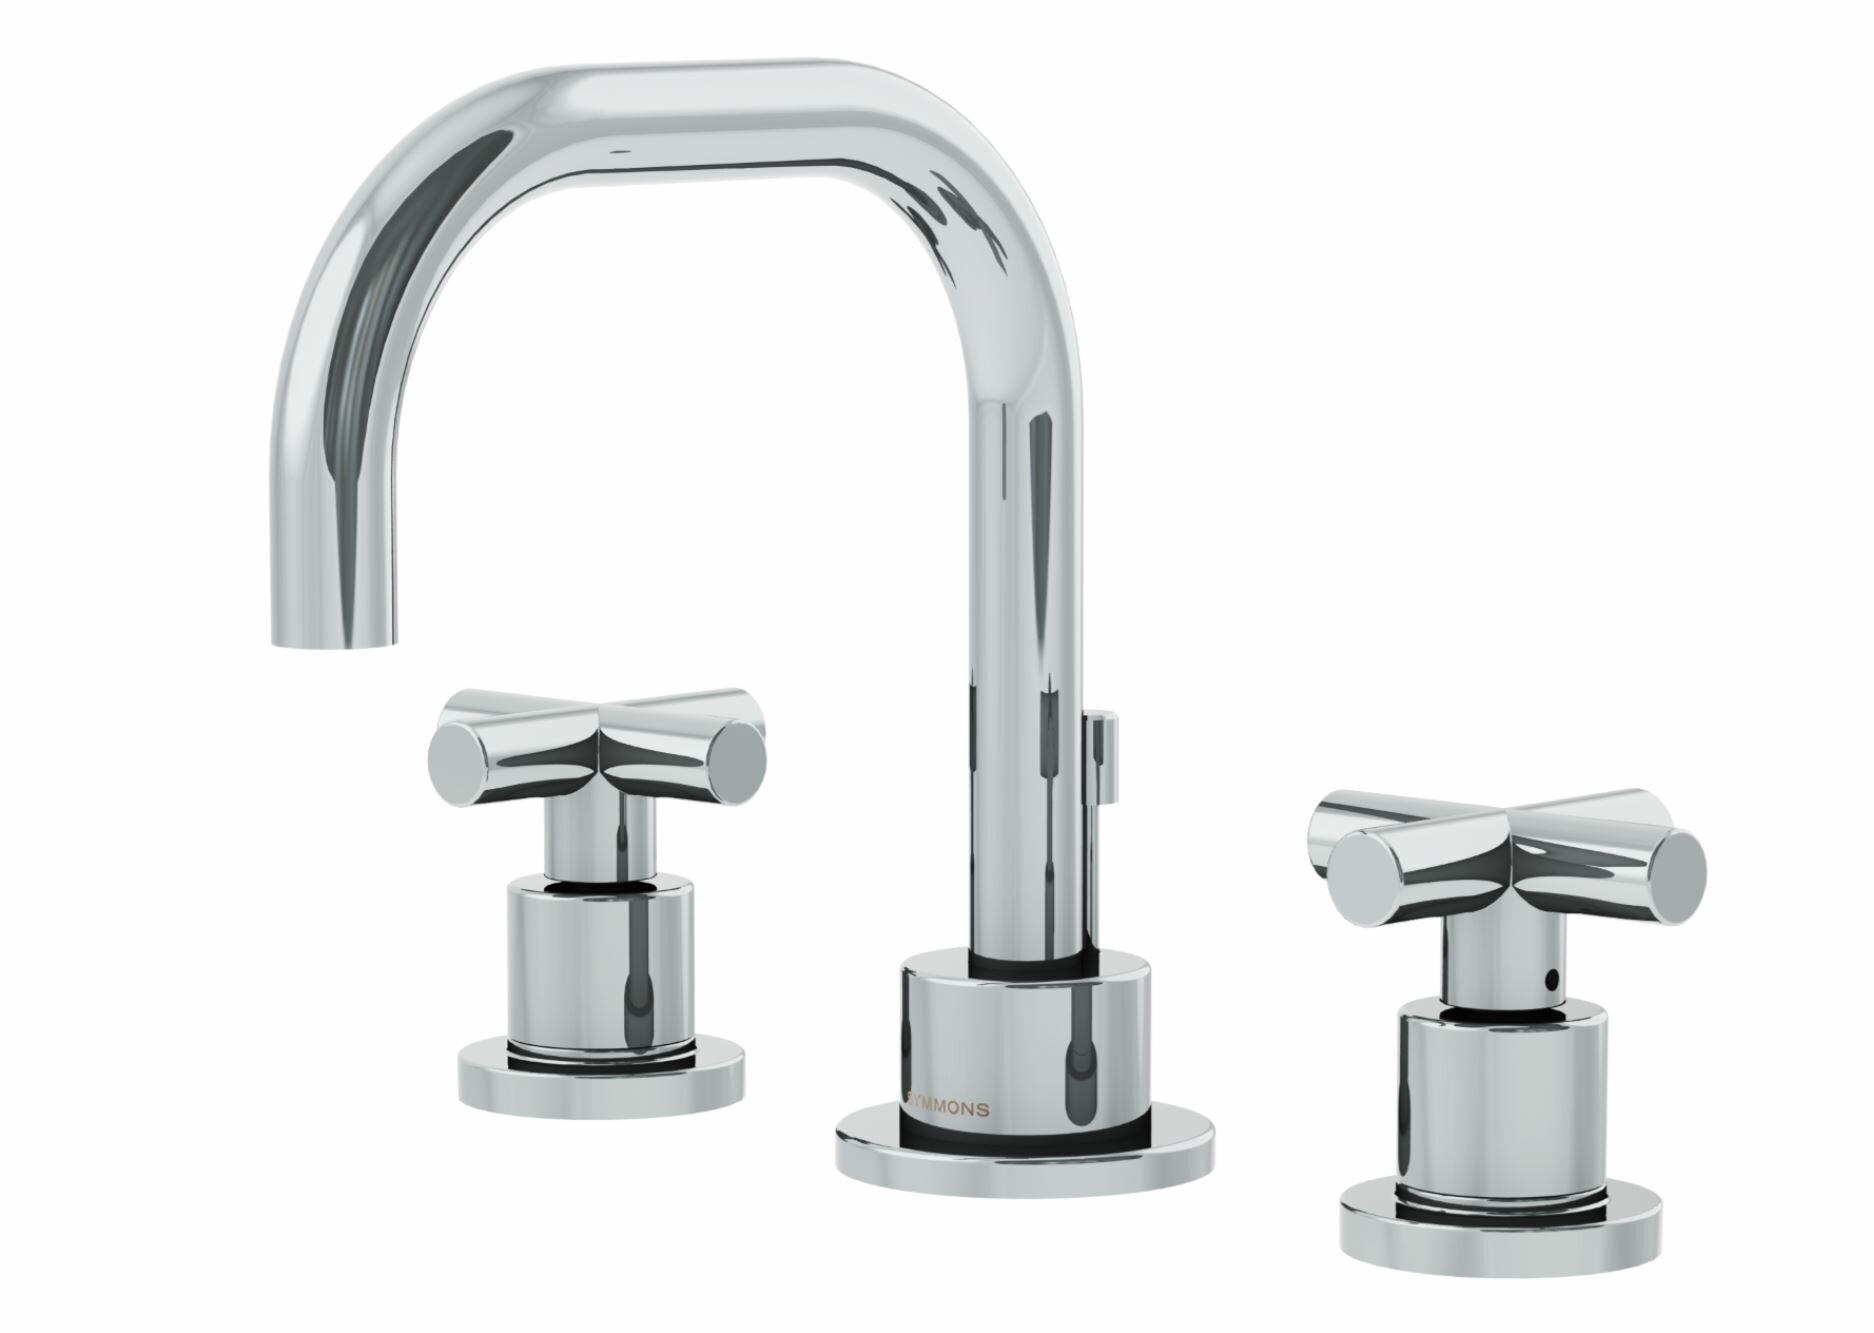 Symmons Dia Widespread Standard Bathroom Faucet Double Cross Handle ...